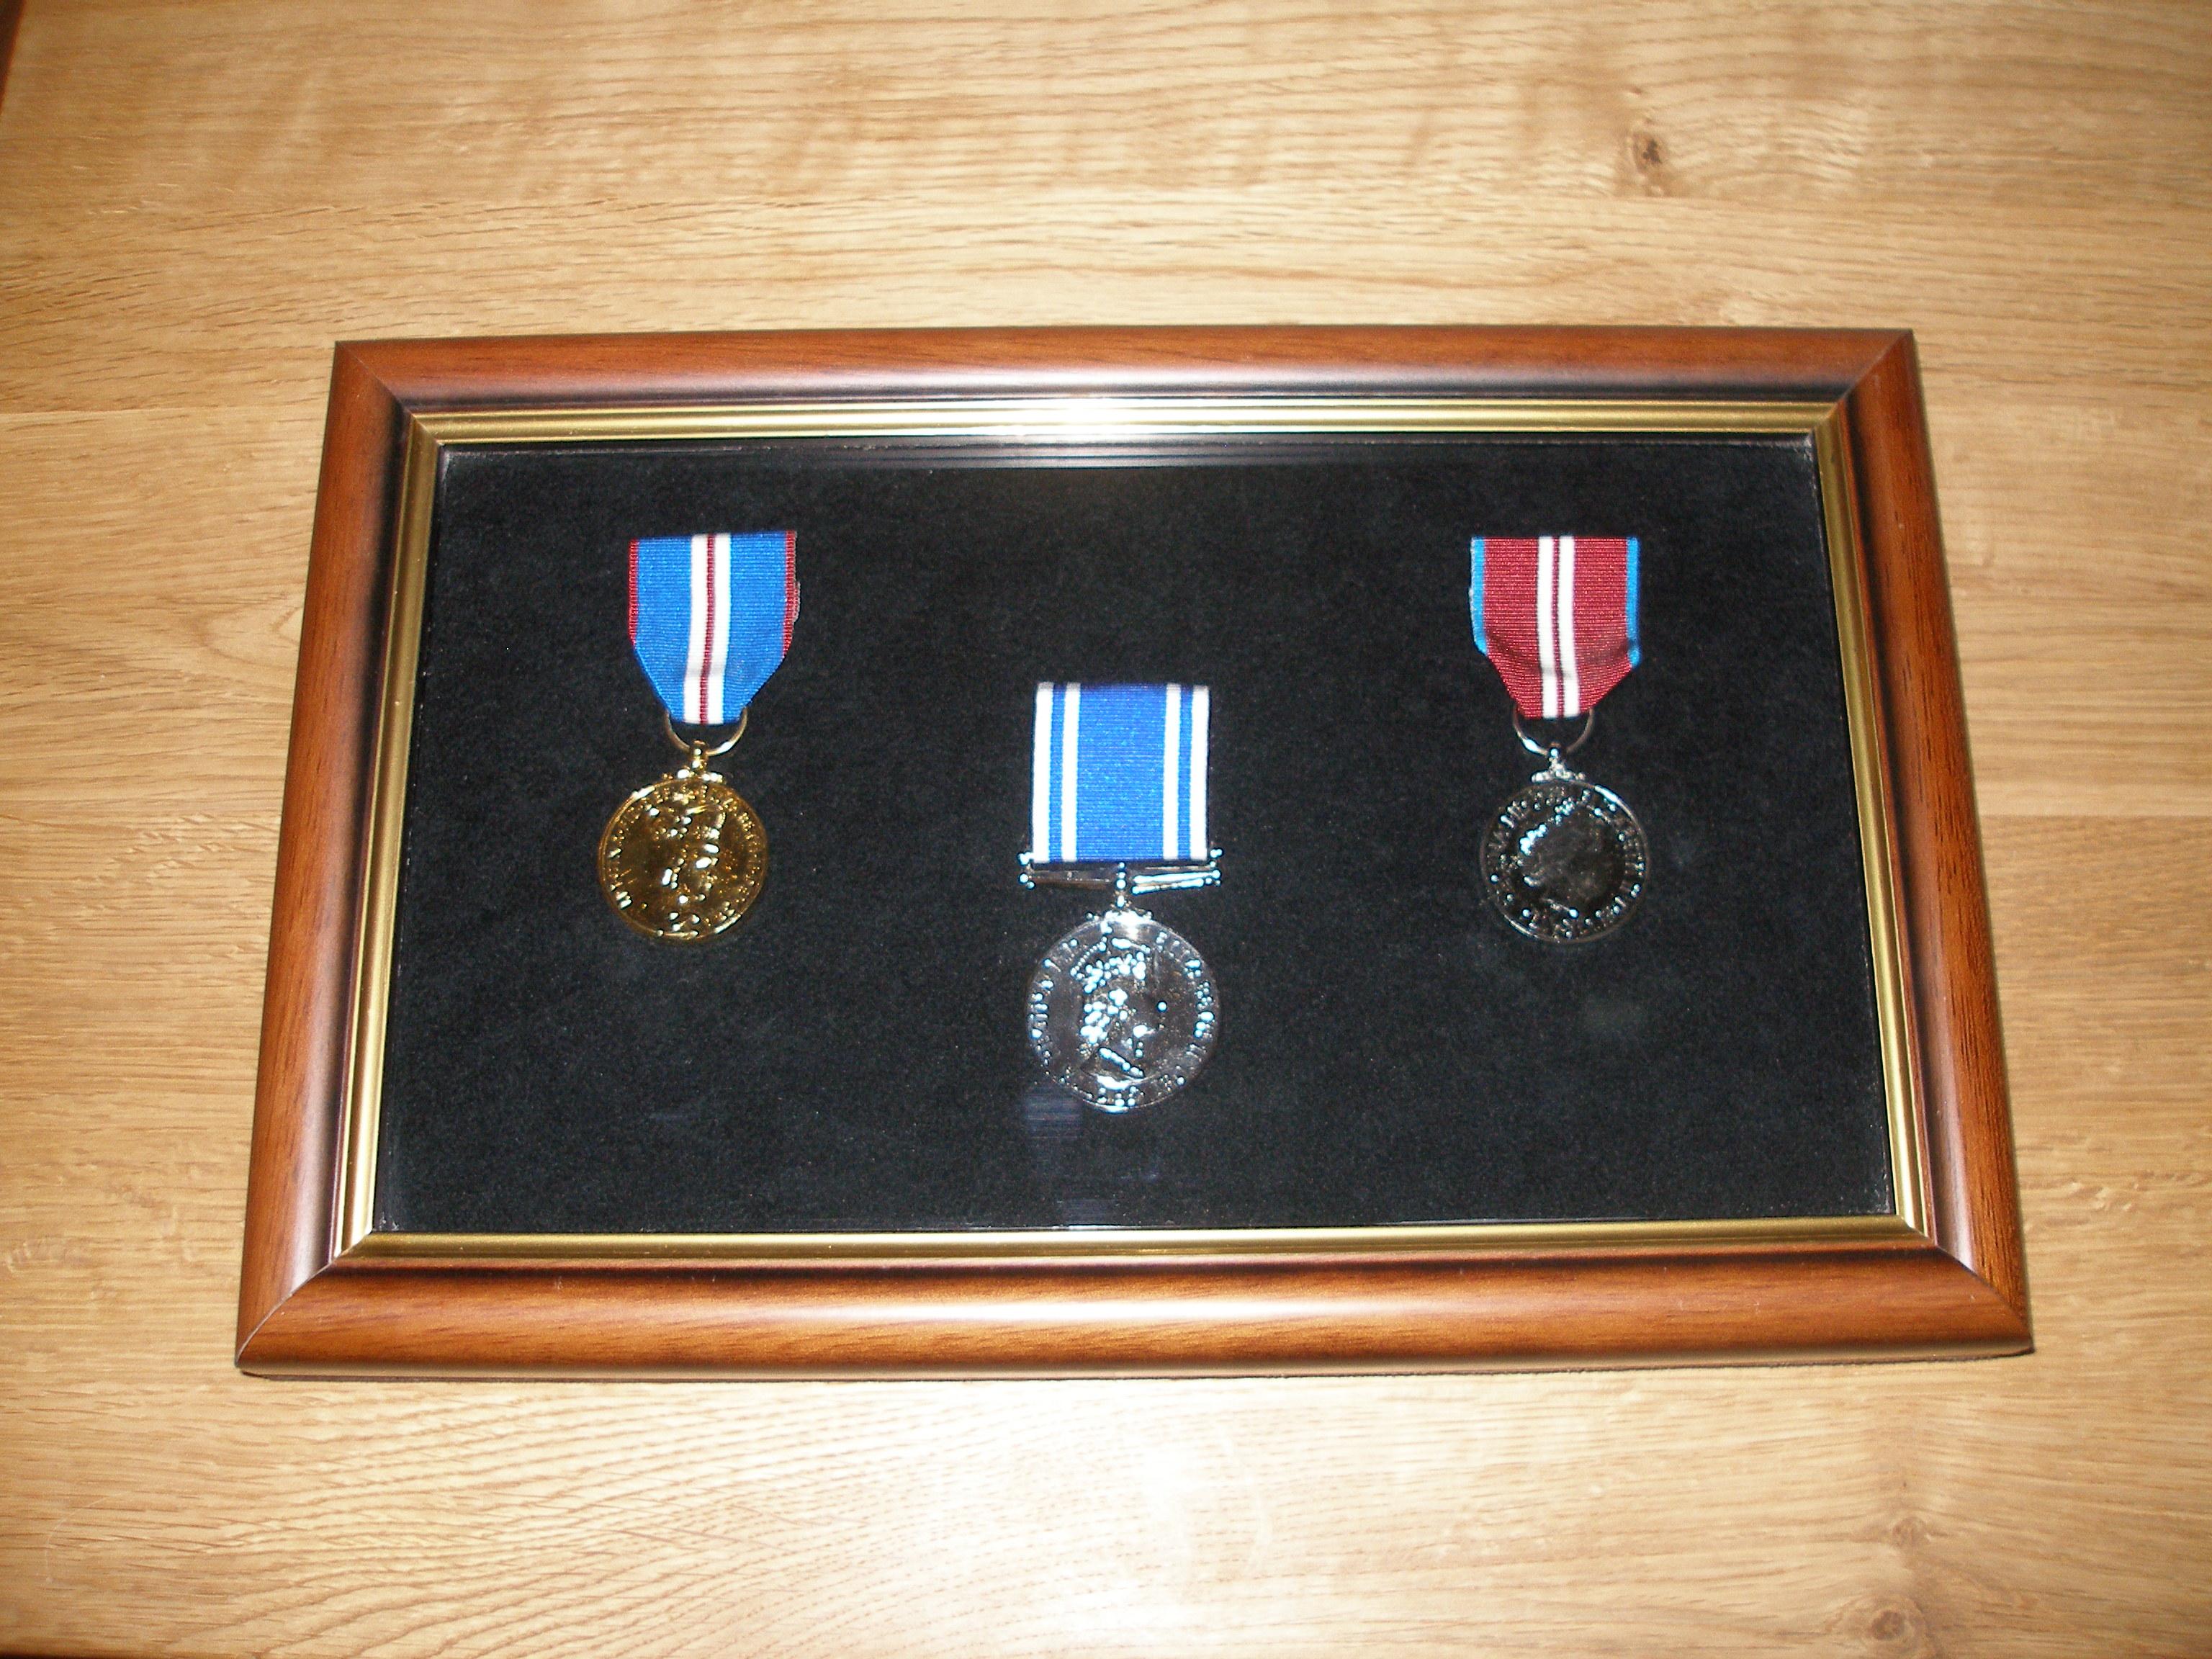 Bespoke Medal Display Case